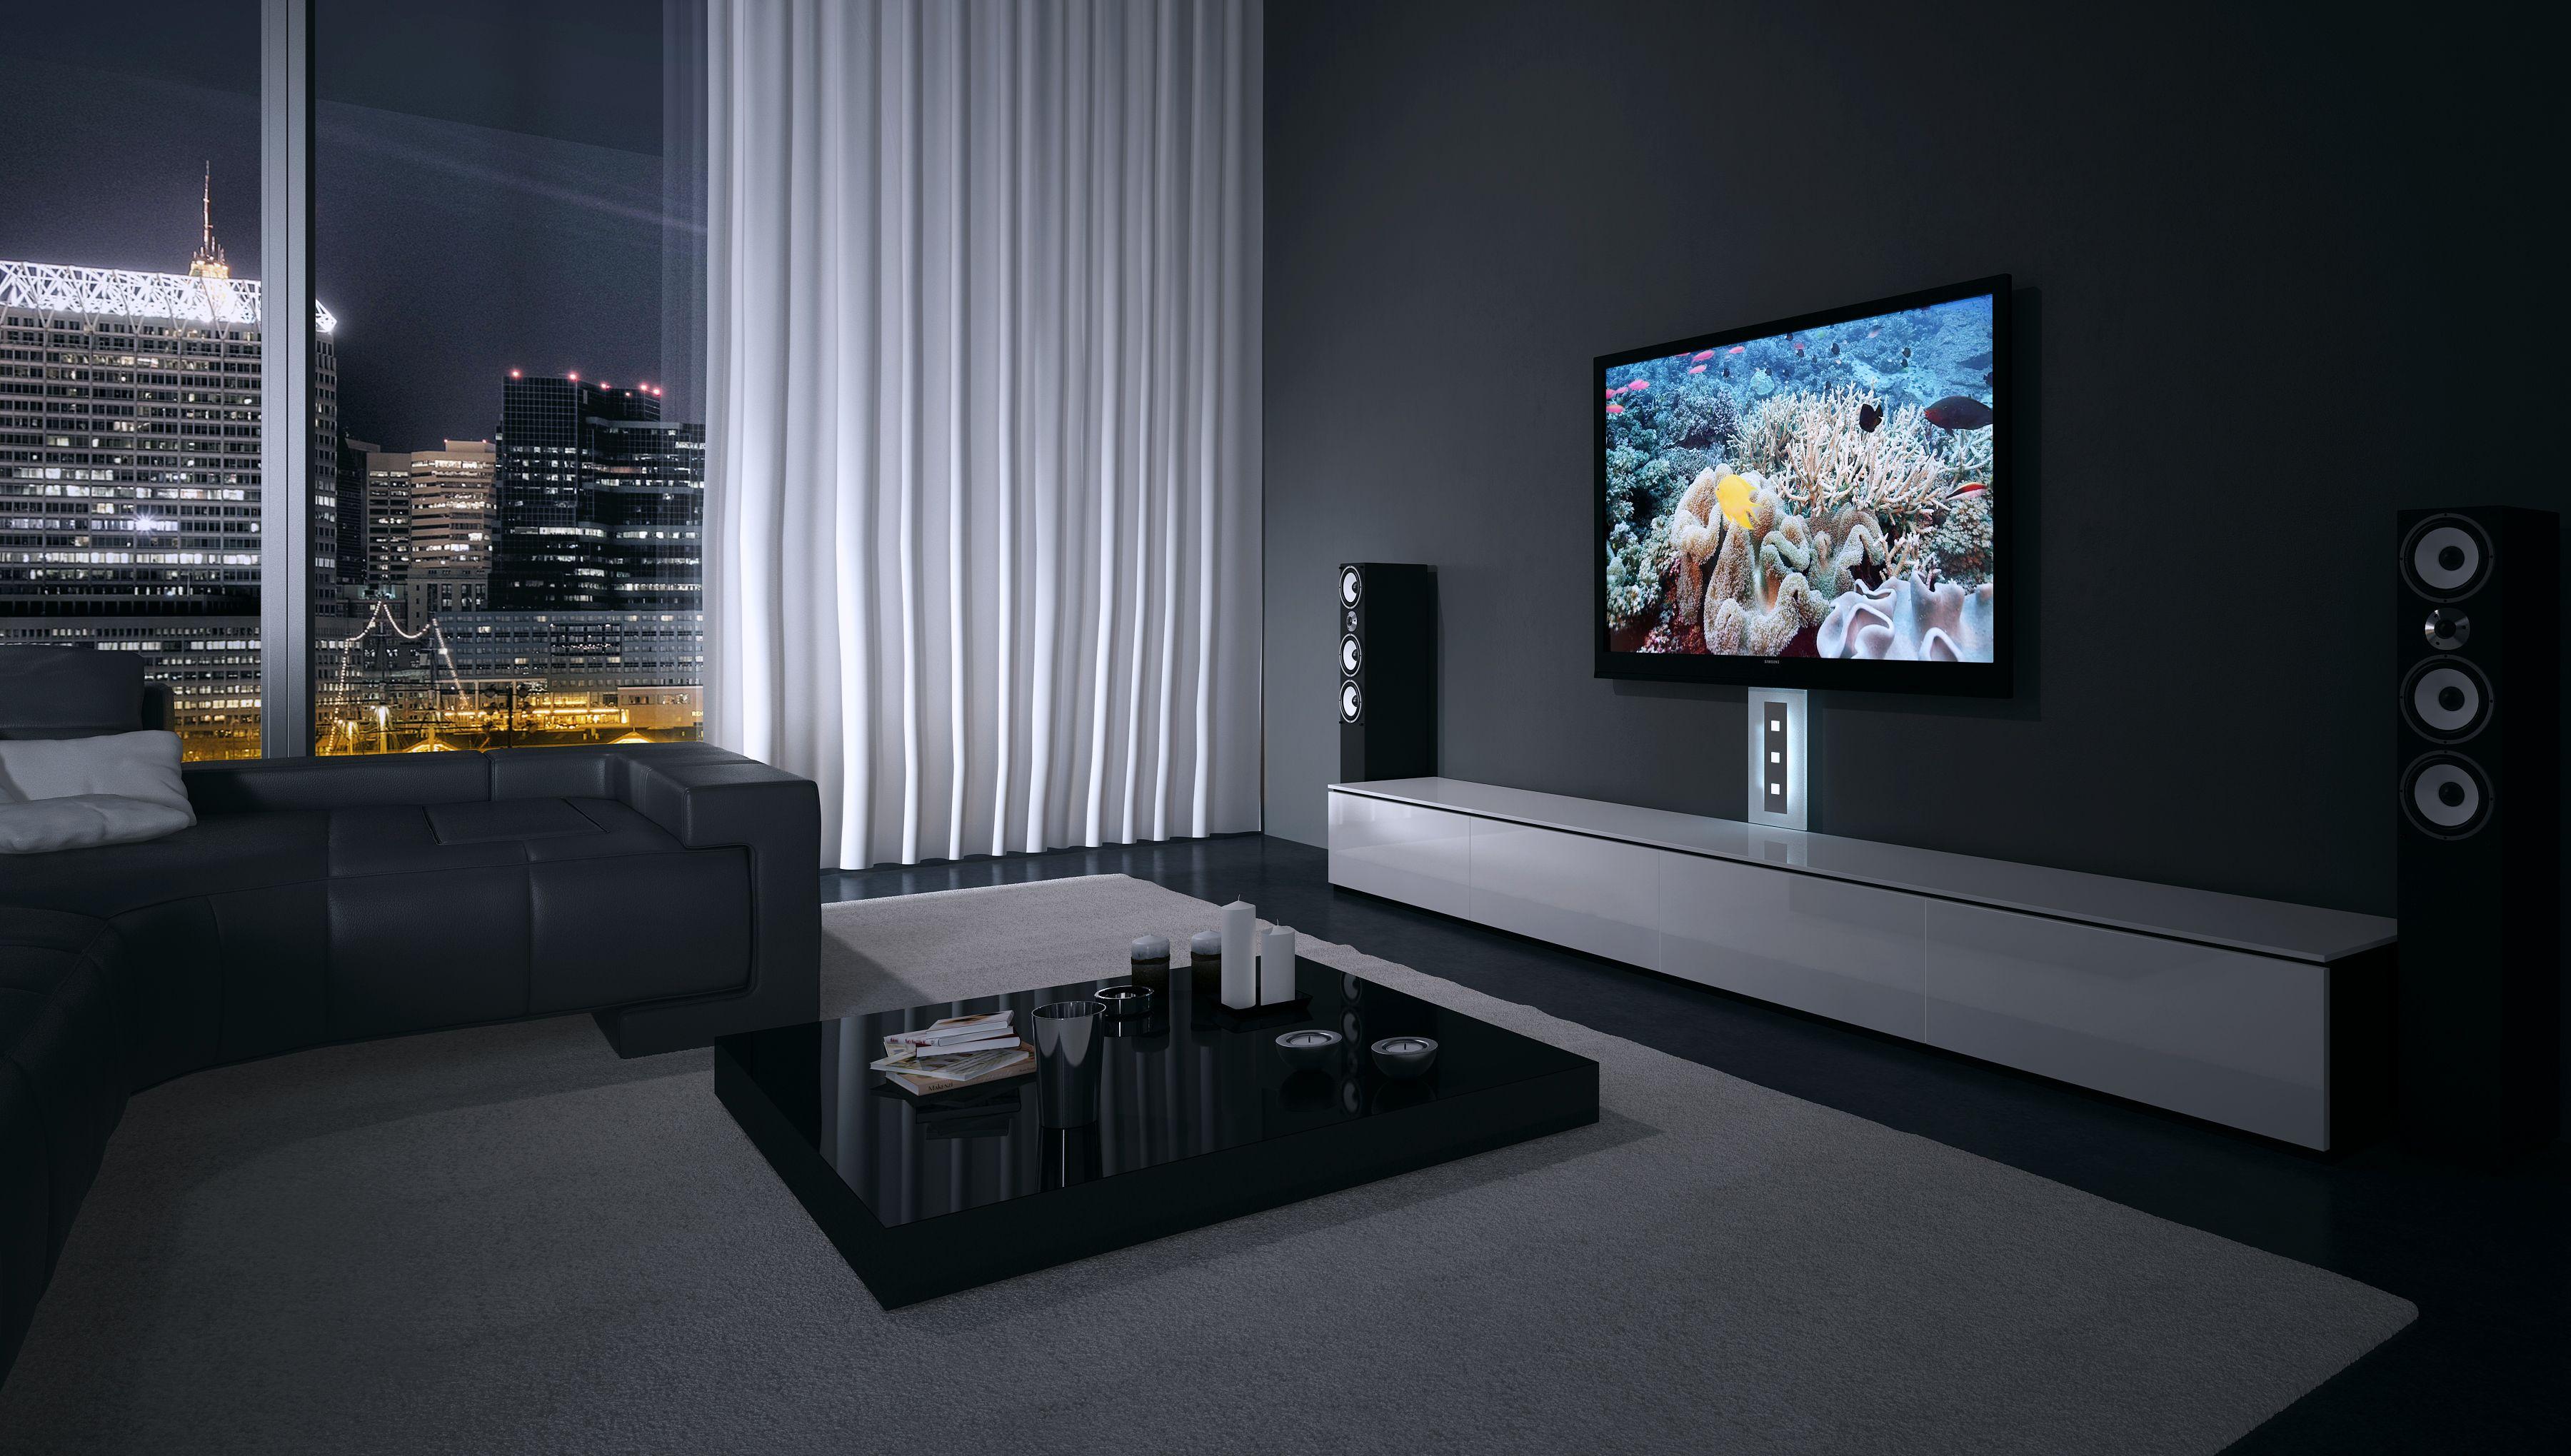 kabelkanal fernseher kabelkanal design tv kabelkanal visioglas design. Black Bedroom Furniture Sets. Home Design Ideas